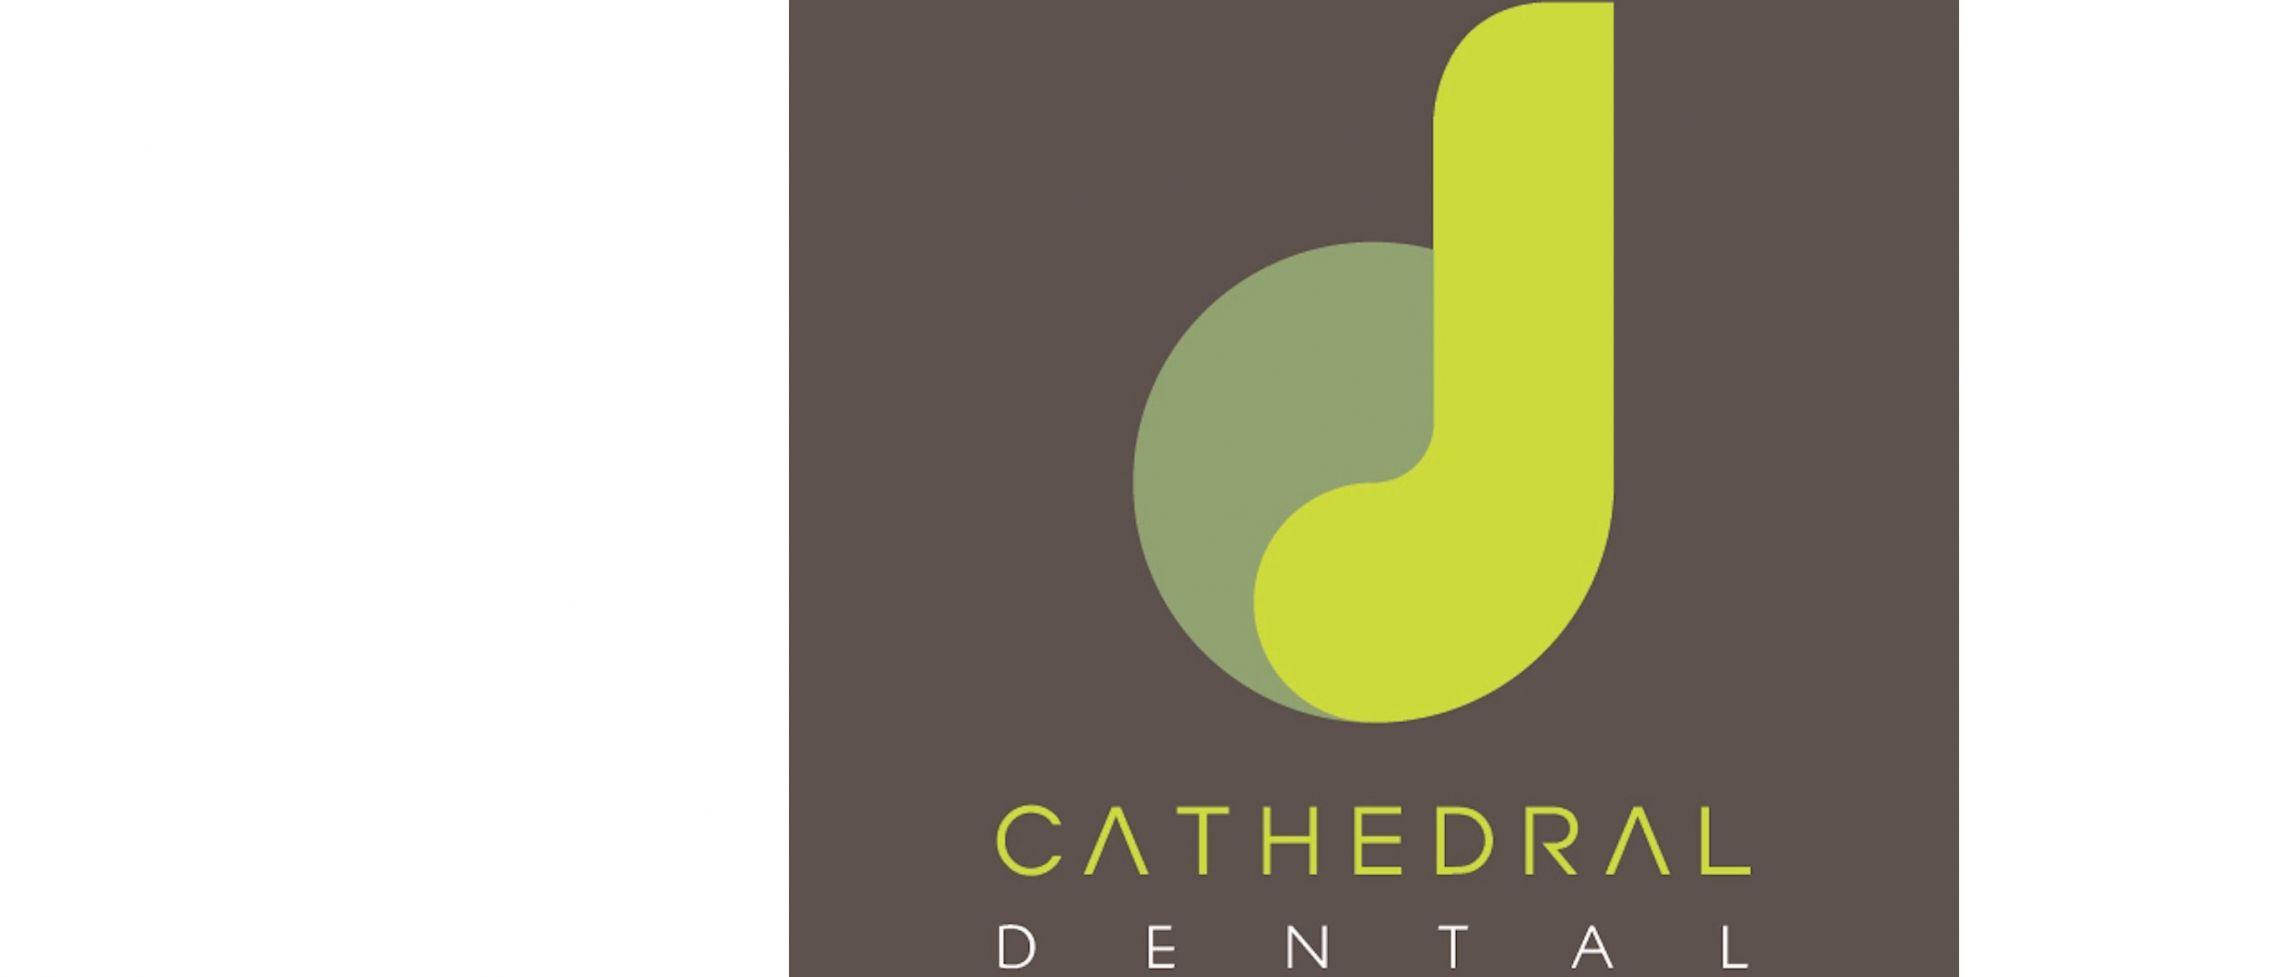 Cathedral Dental Practice - The MiSmile Network